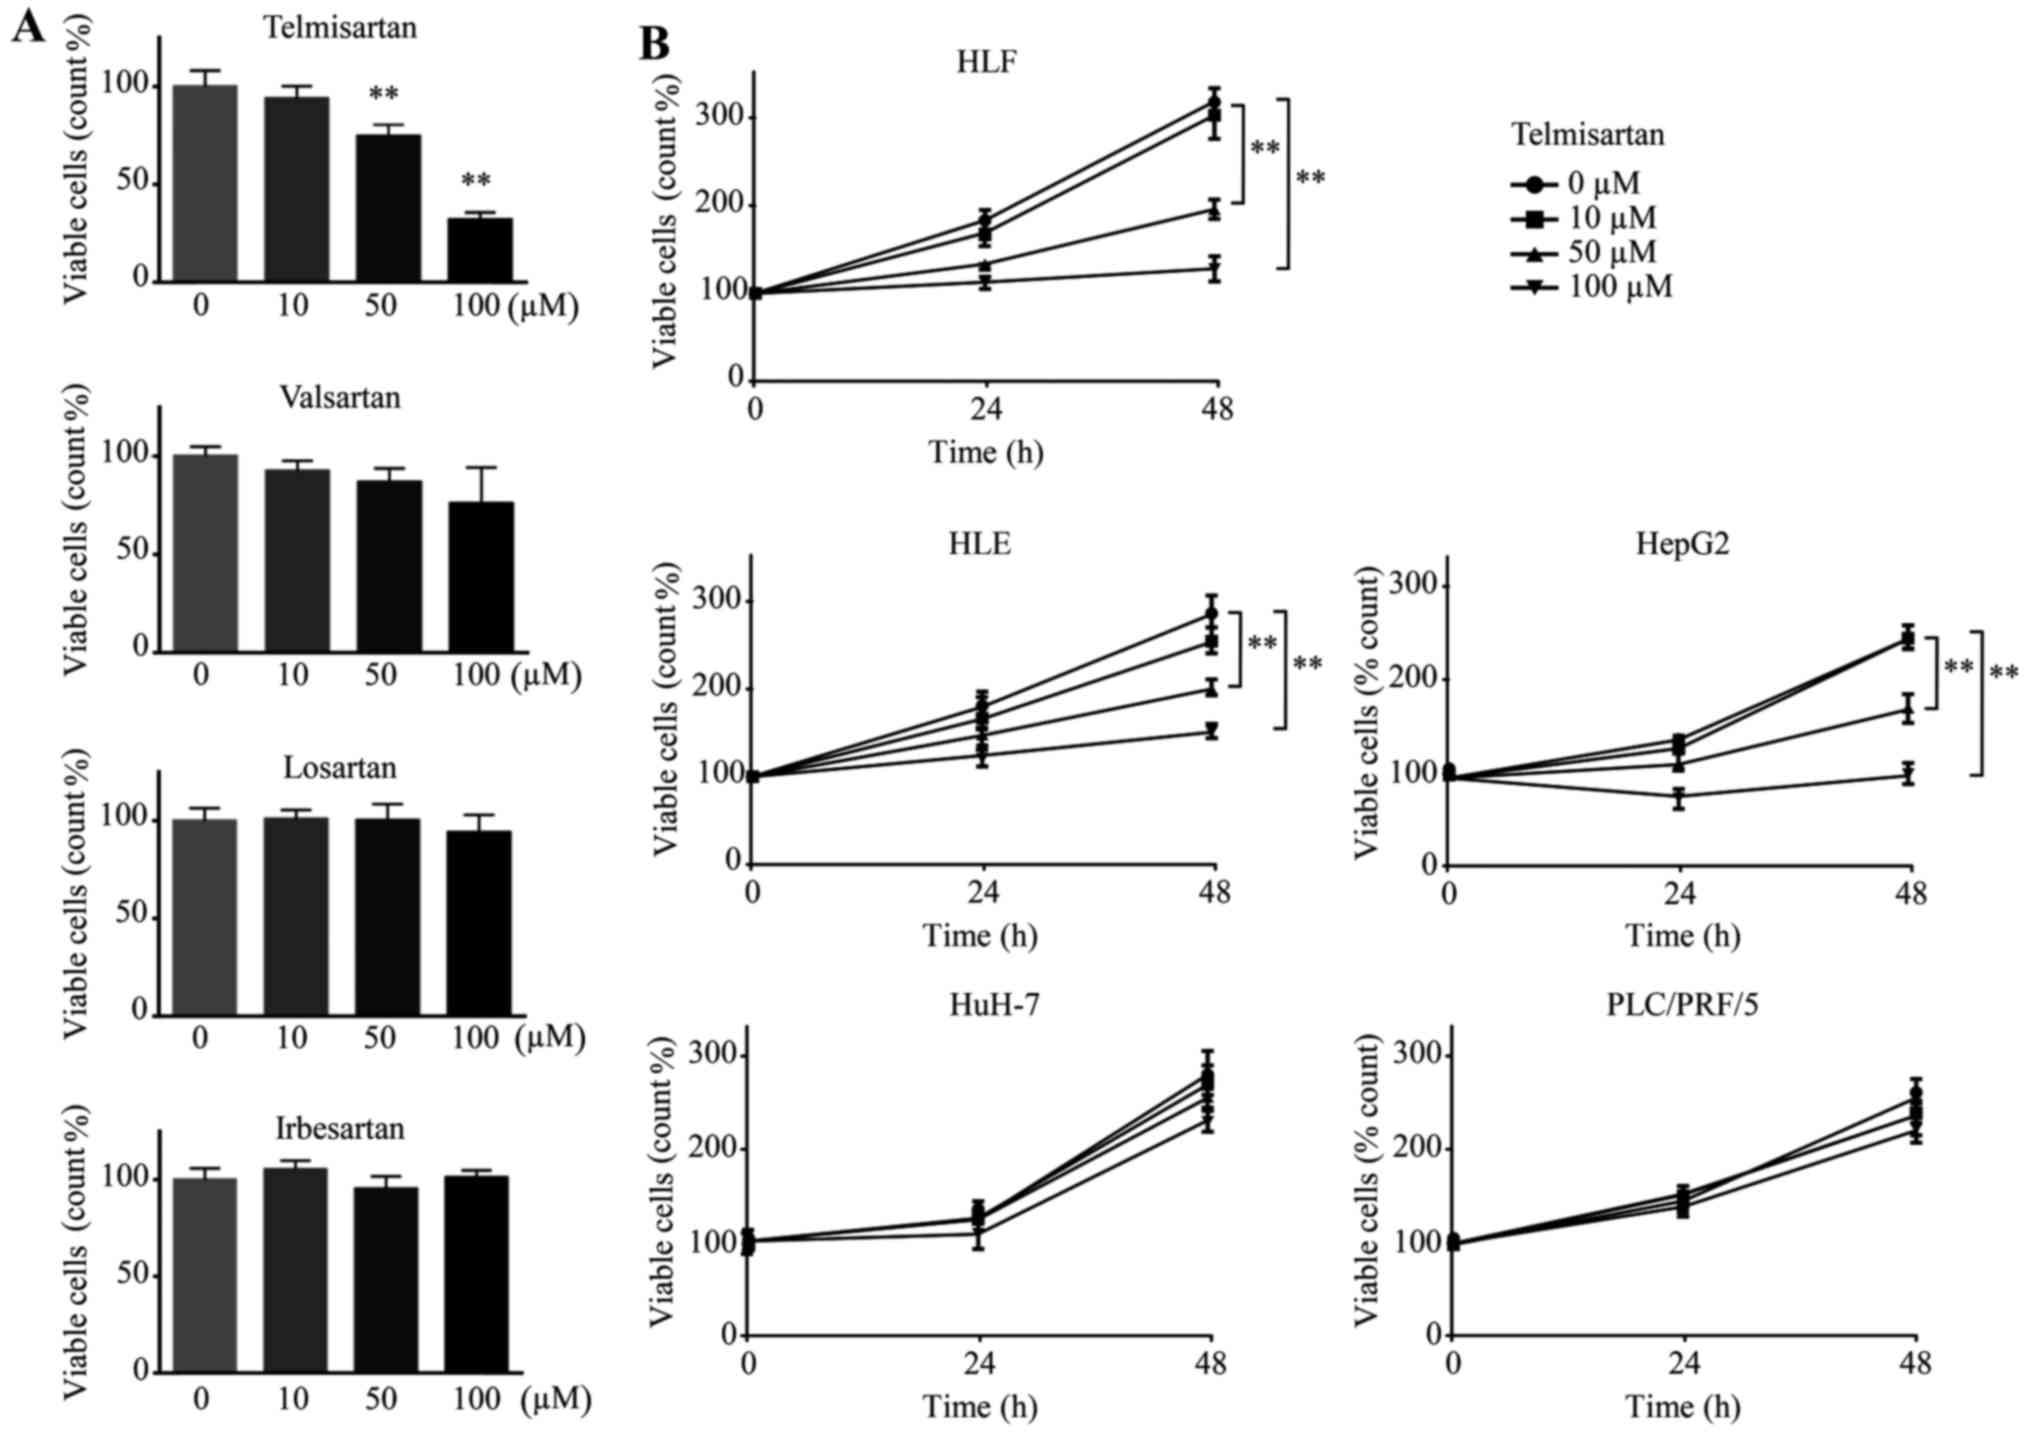 Telmisartan Inhibits Hepatocellular Carcinoma Cell Proliferation In Figure1 Phone Jammer Circuit Diagram Figure 1 The Of Hlf Cells A Effects Arbs Valsartan Losartan And Irbesartan On